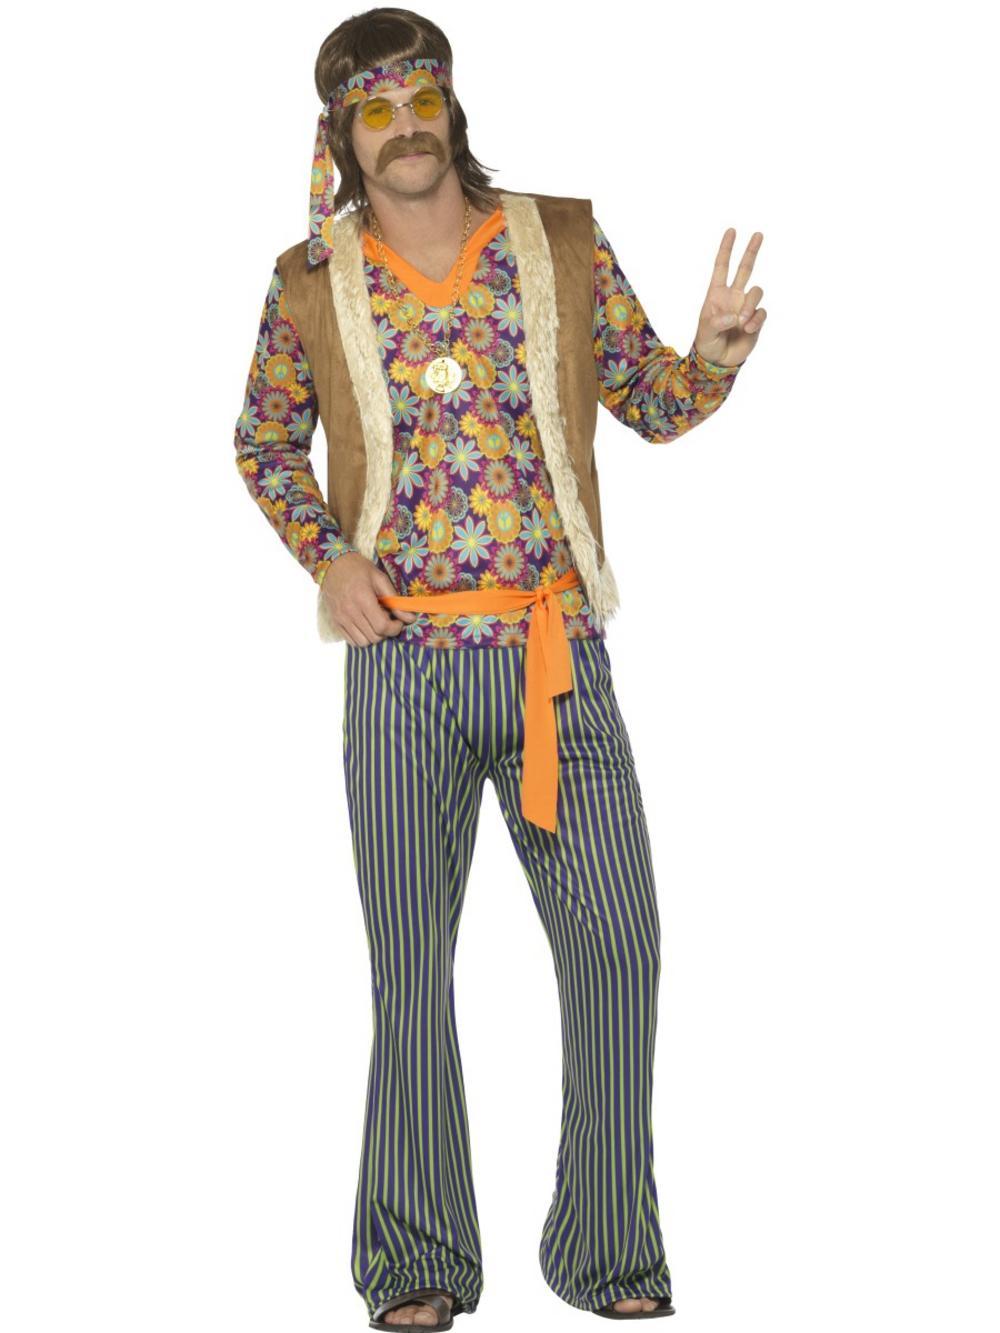 60s Singer Costume Male